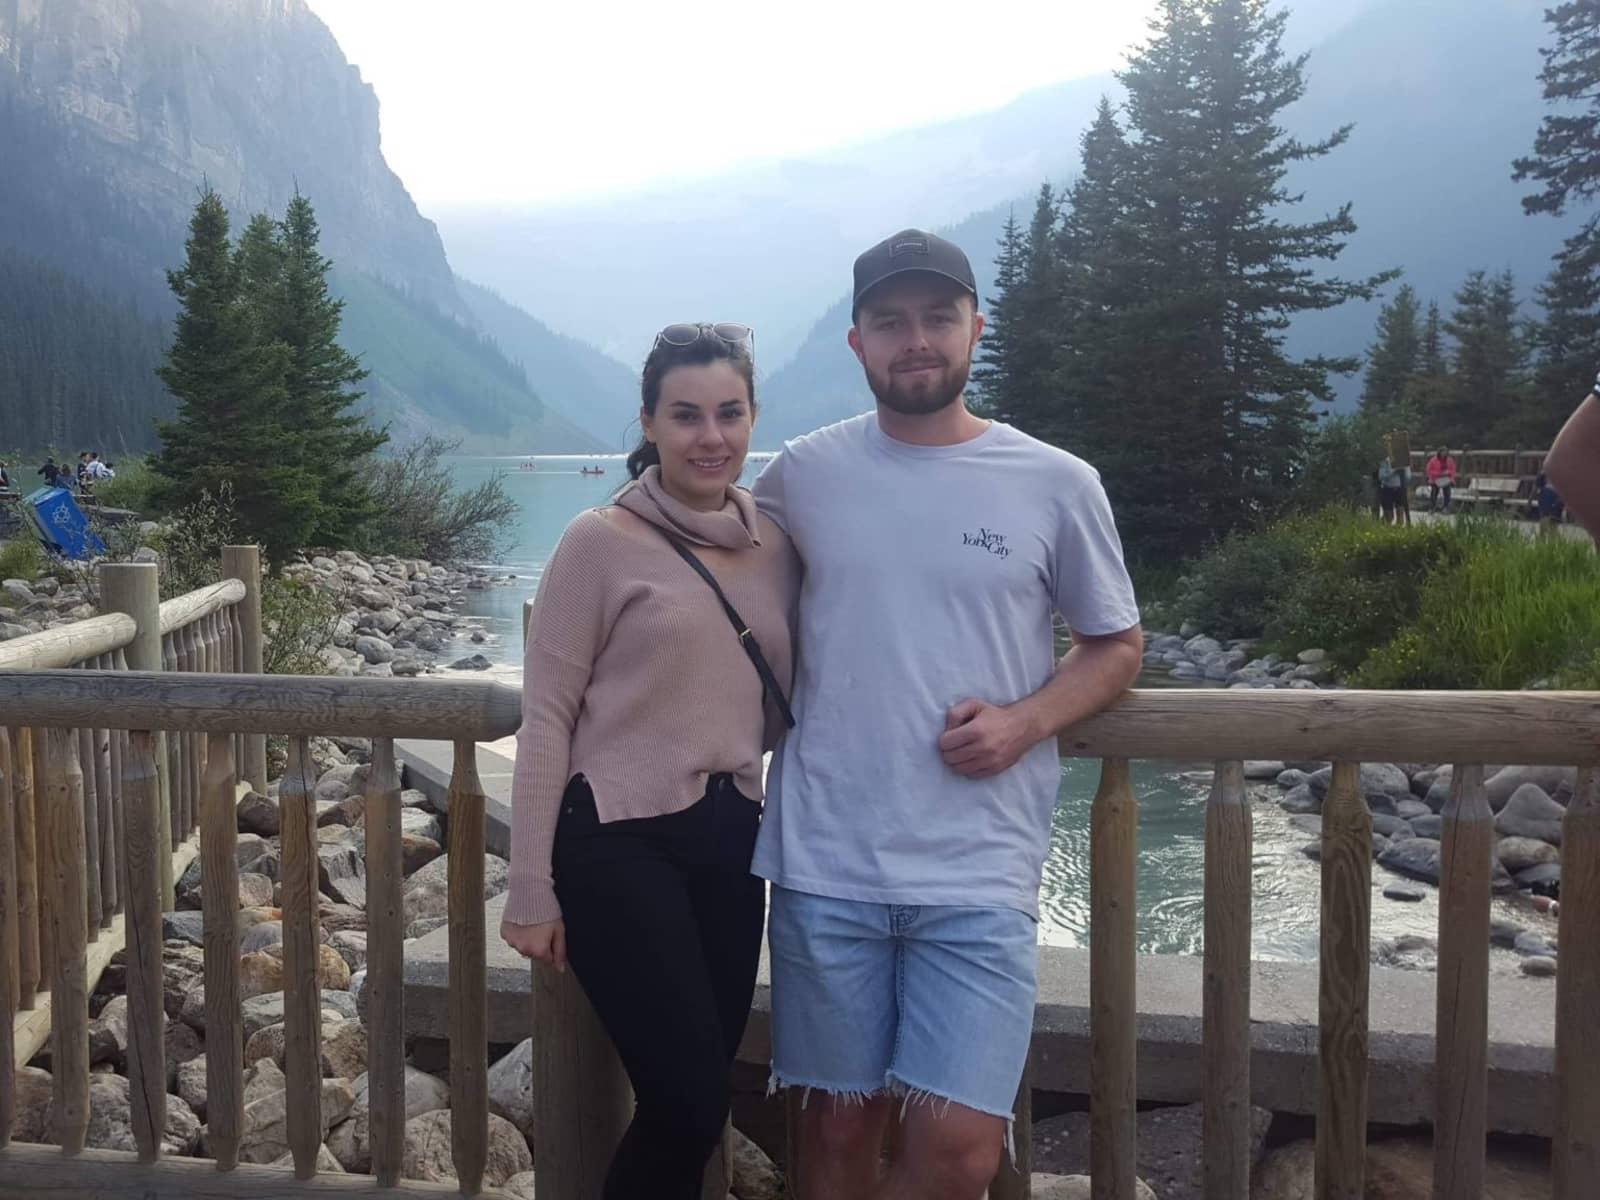 Taylor & Kieron from Toronto, Ontario, Canada